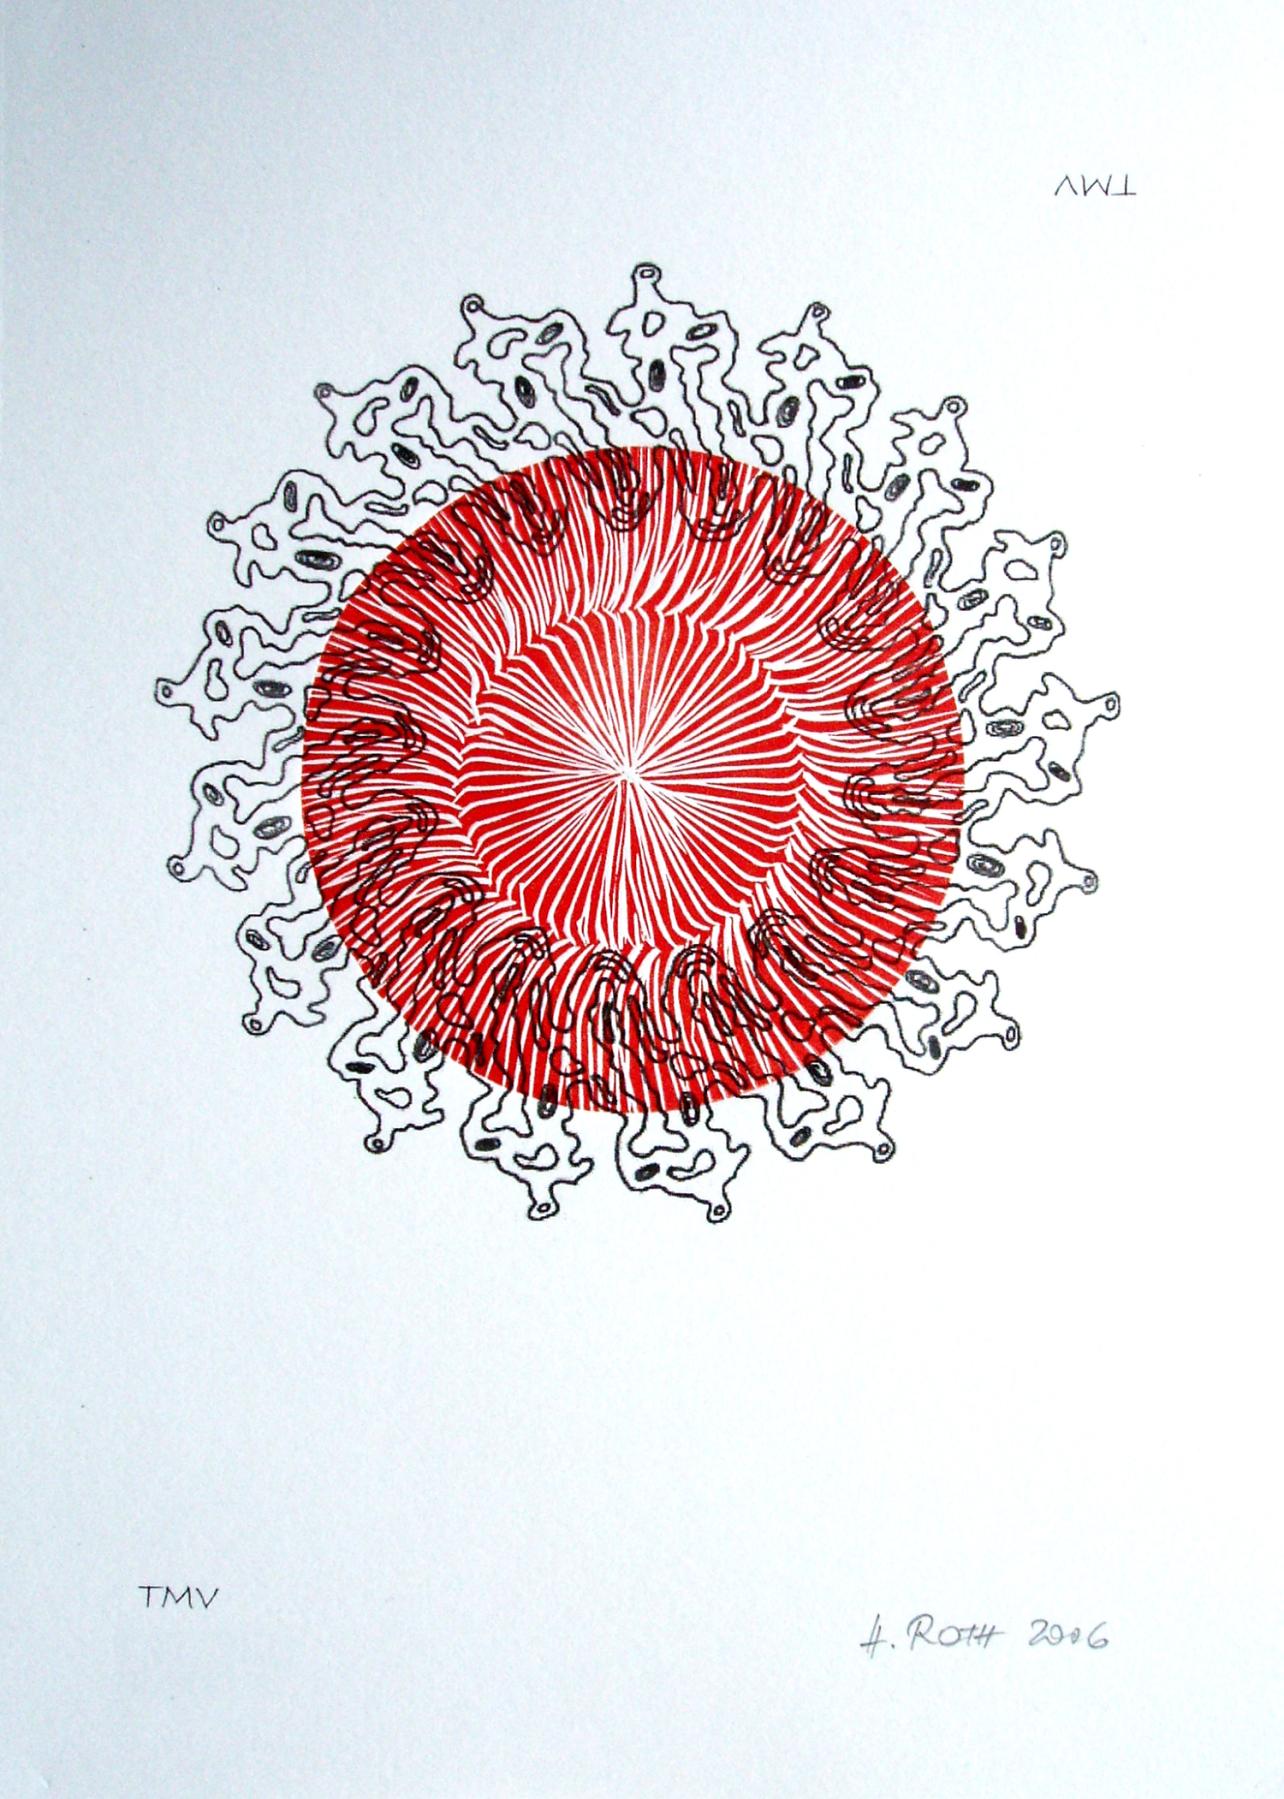 TMV - Tabakmosaikvirus